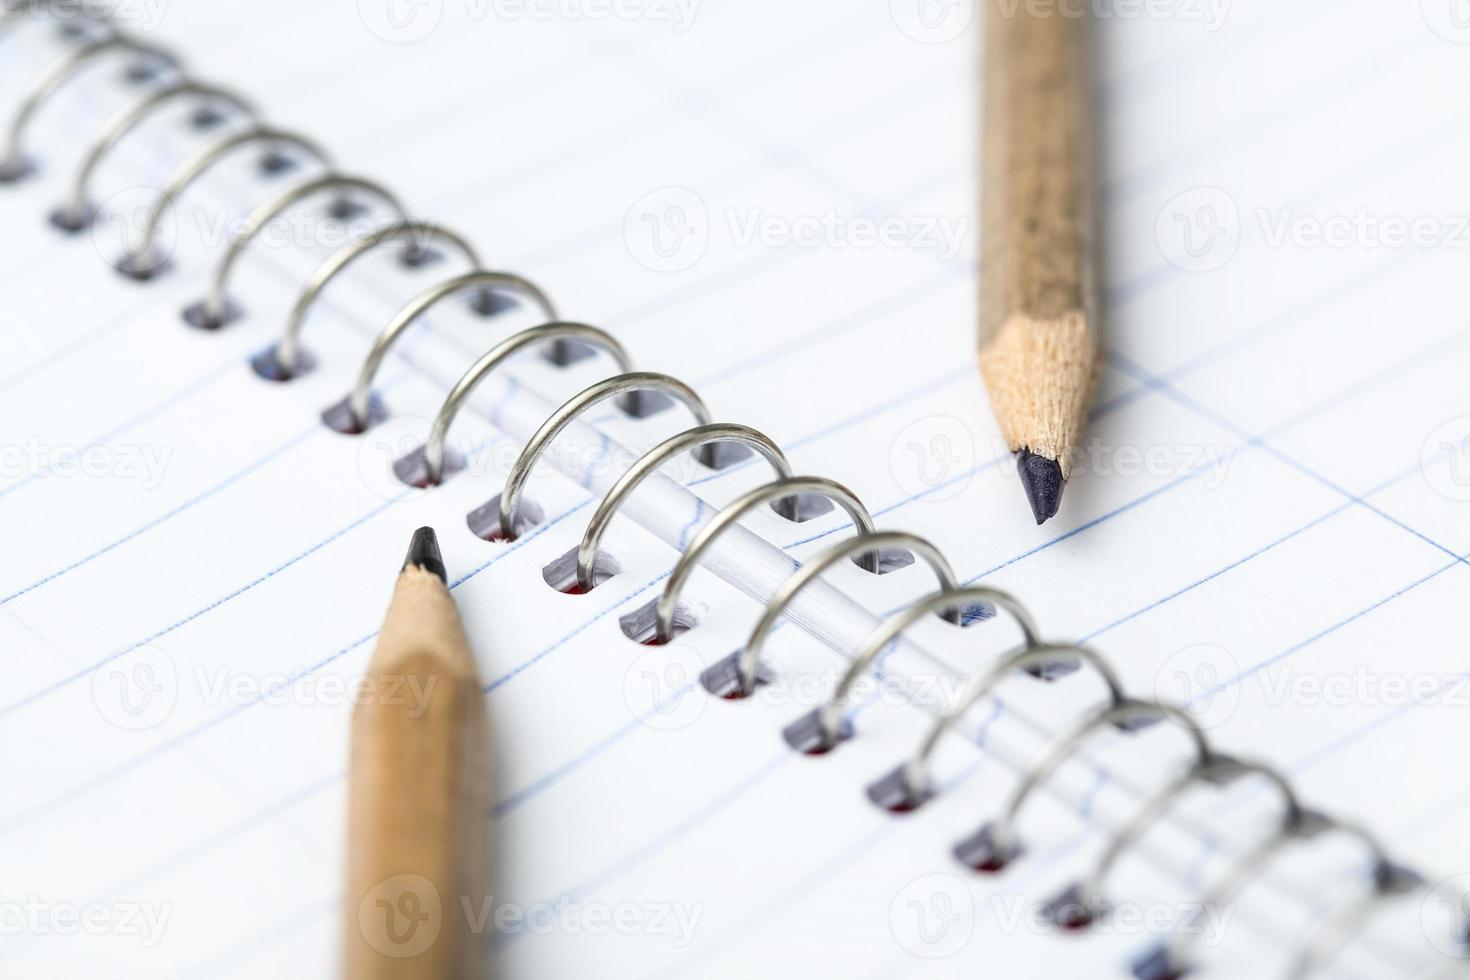 twee eenvoudige potlood foto